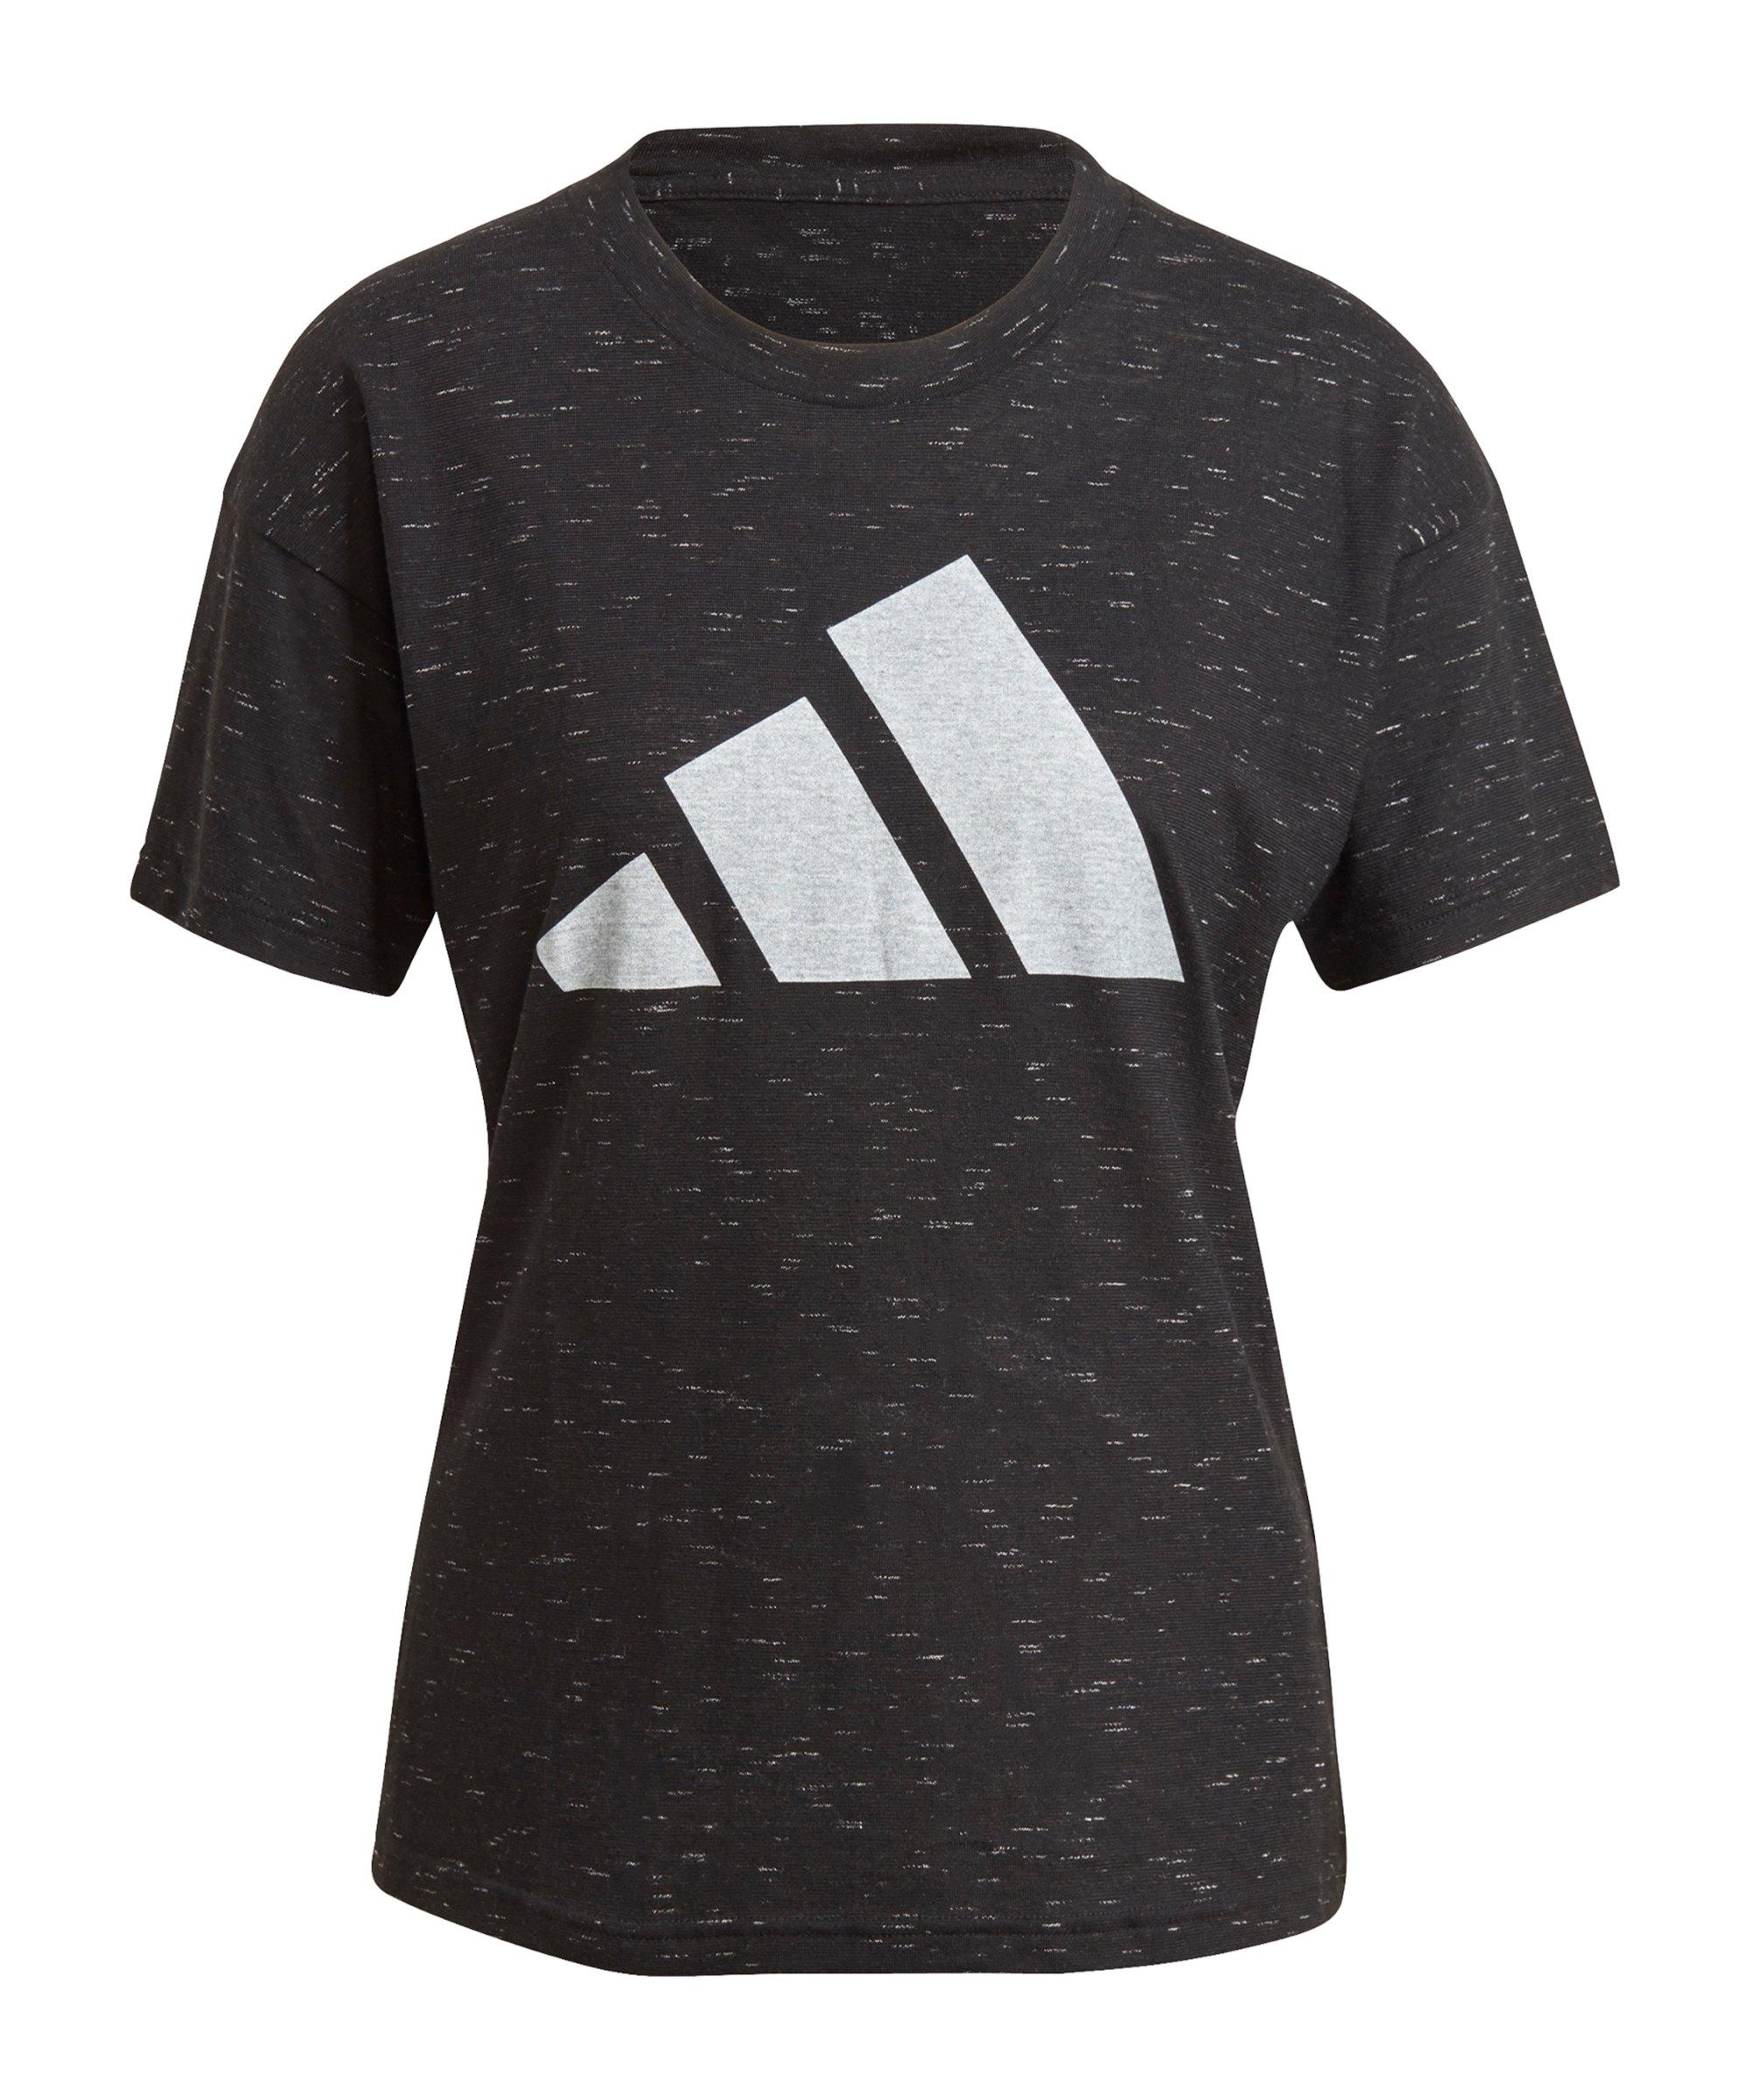 adidas Winners 2.0 T-Shirt Damen Schwarz - schwarz